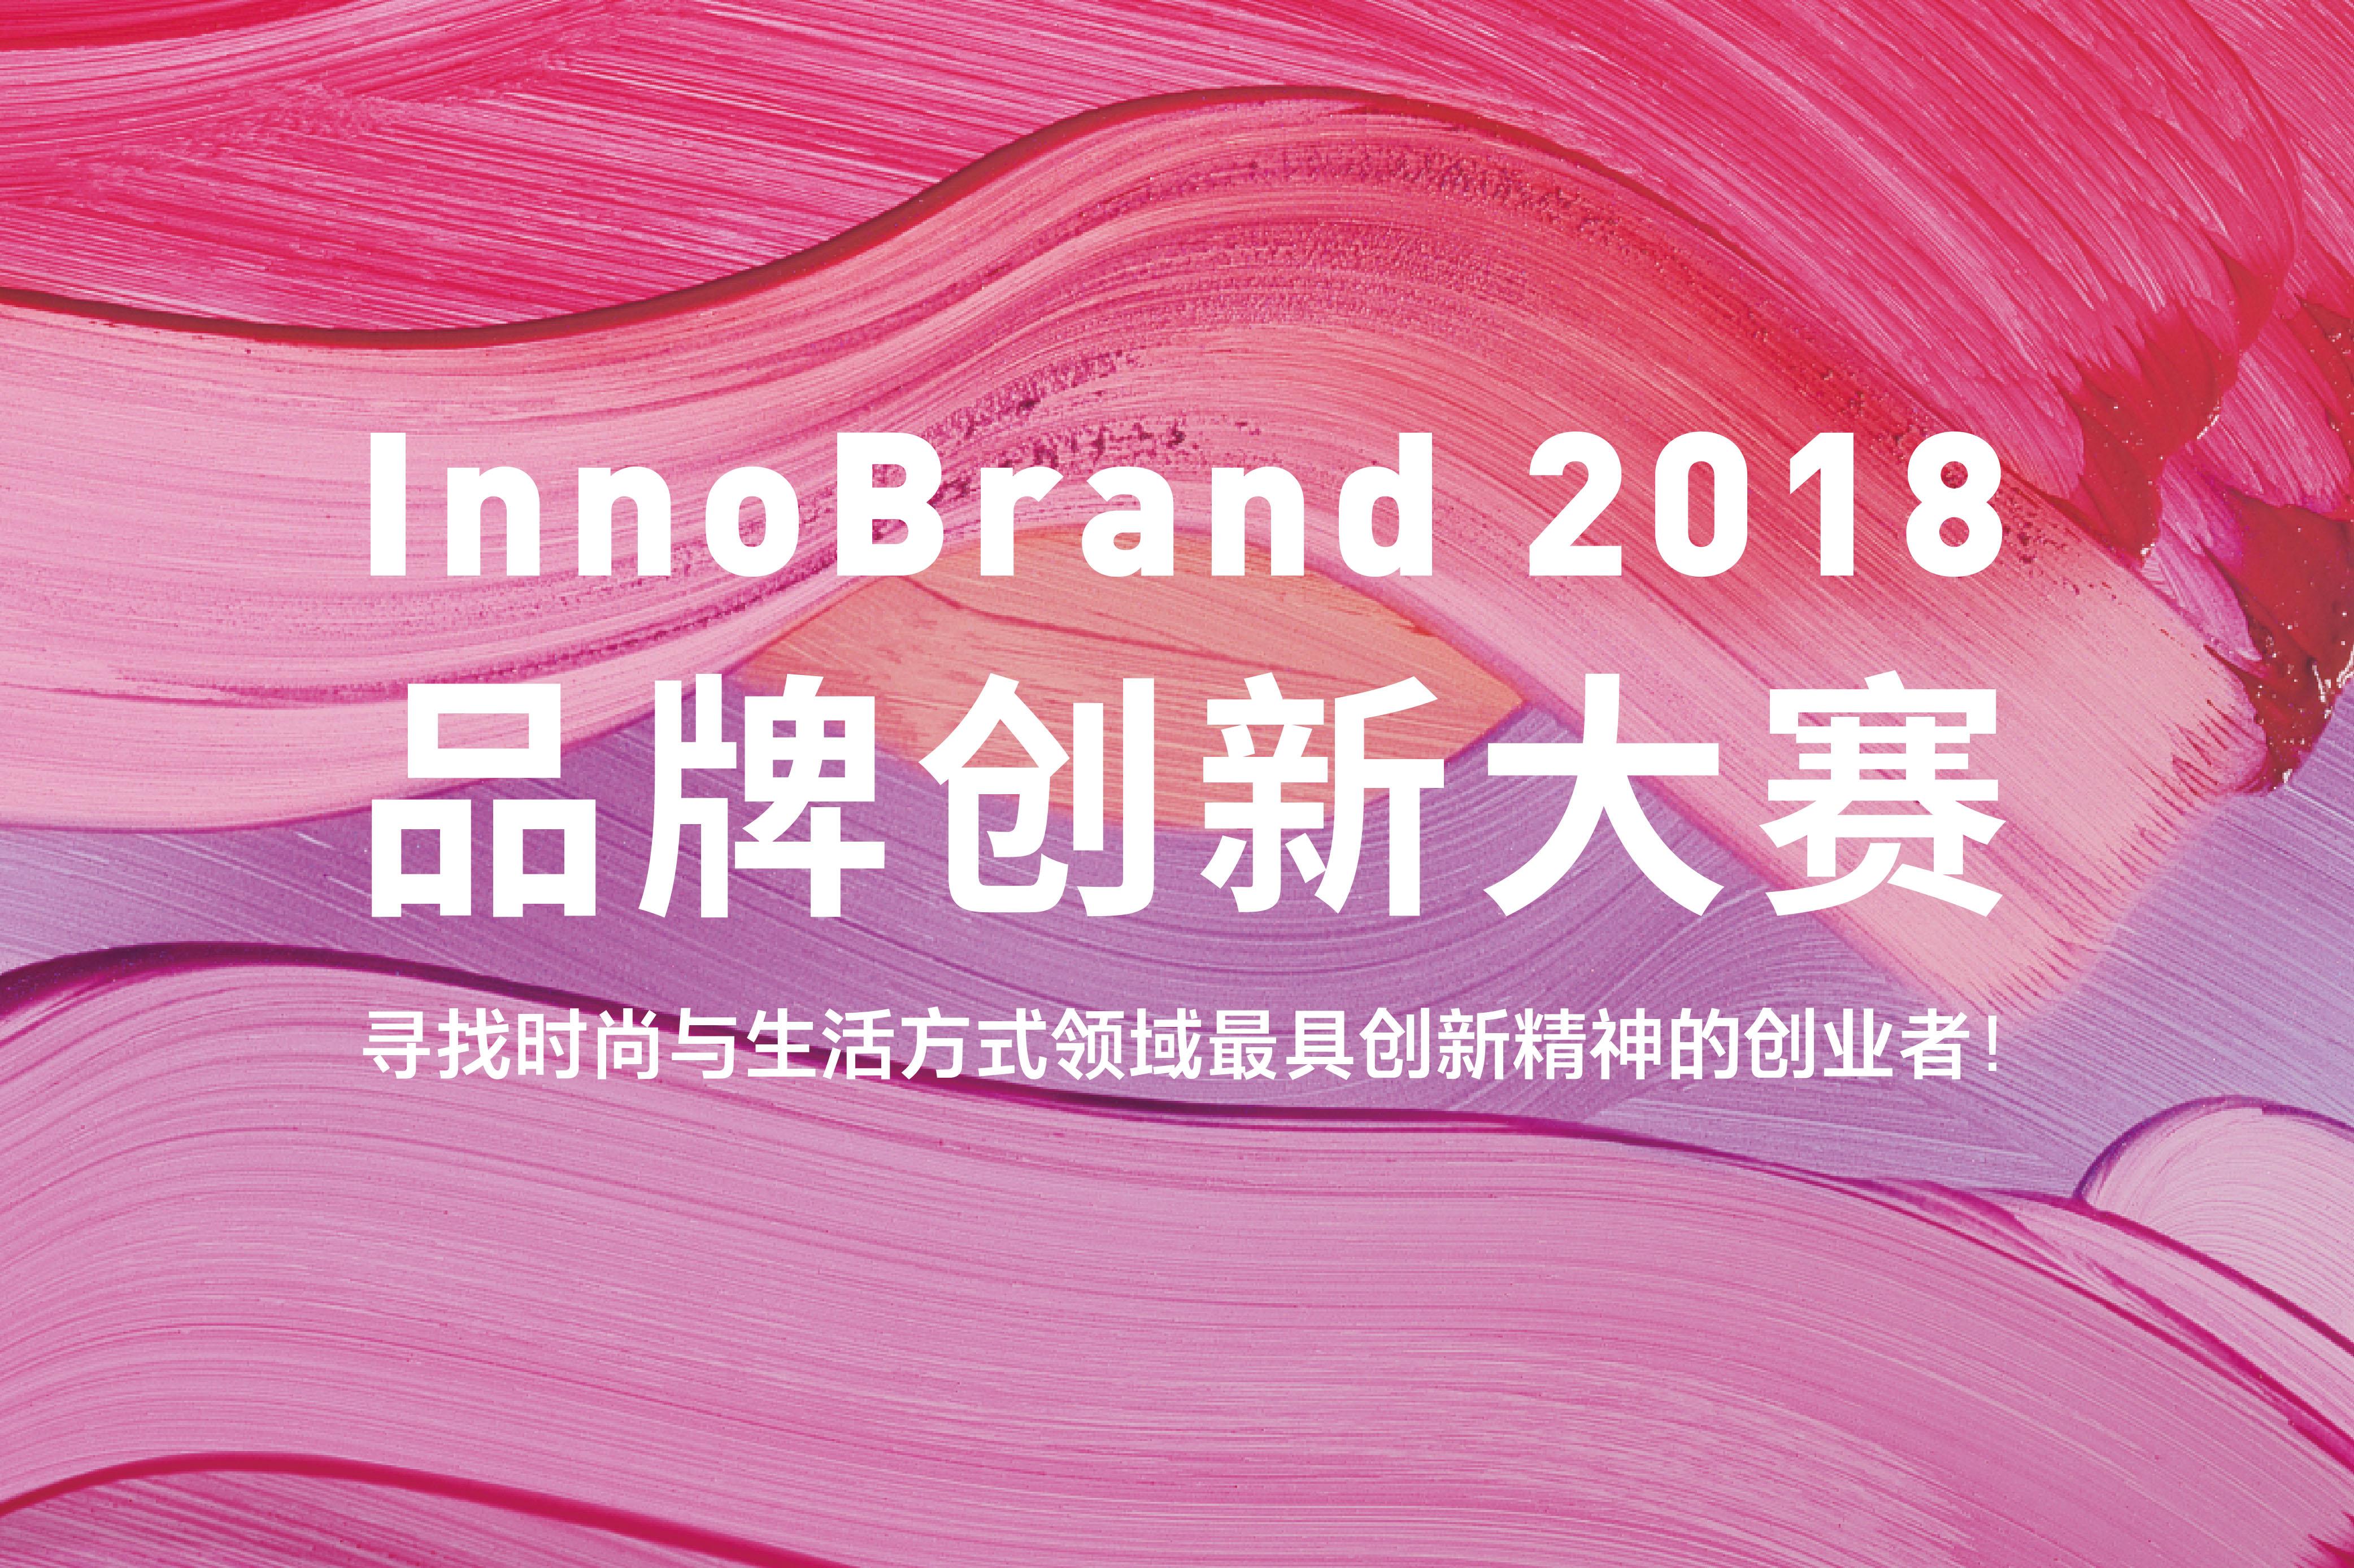 InnoBrand 2018 品牌创新大赛十六强揭晓!11月30日总决赛,坐标上海(仅开放50个观摩席位)